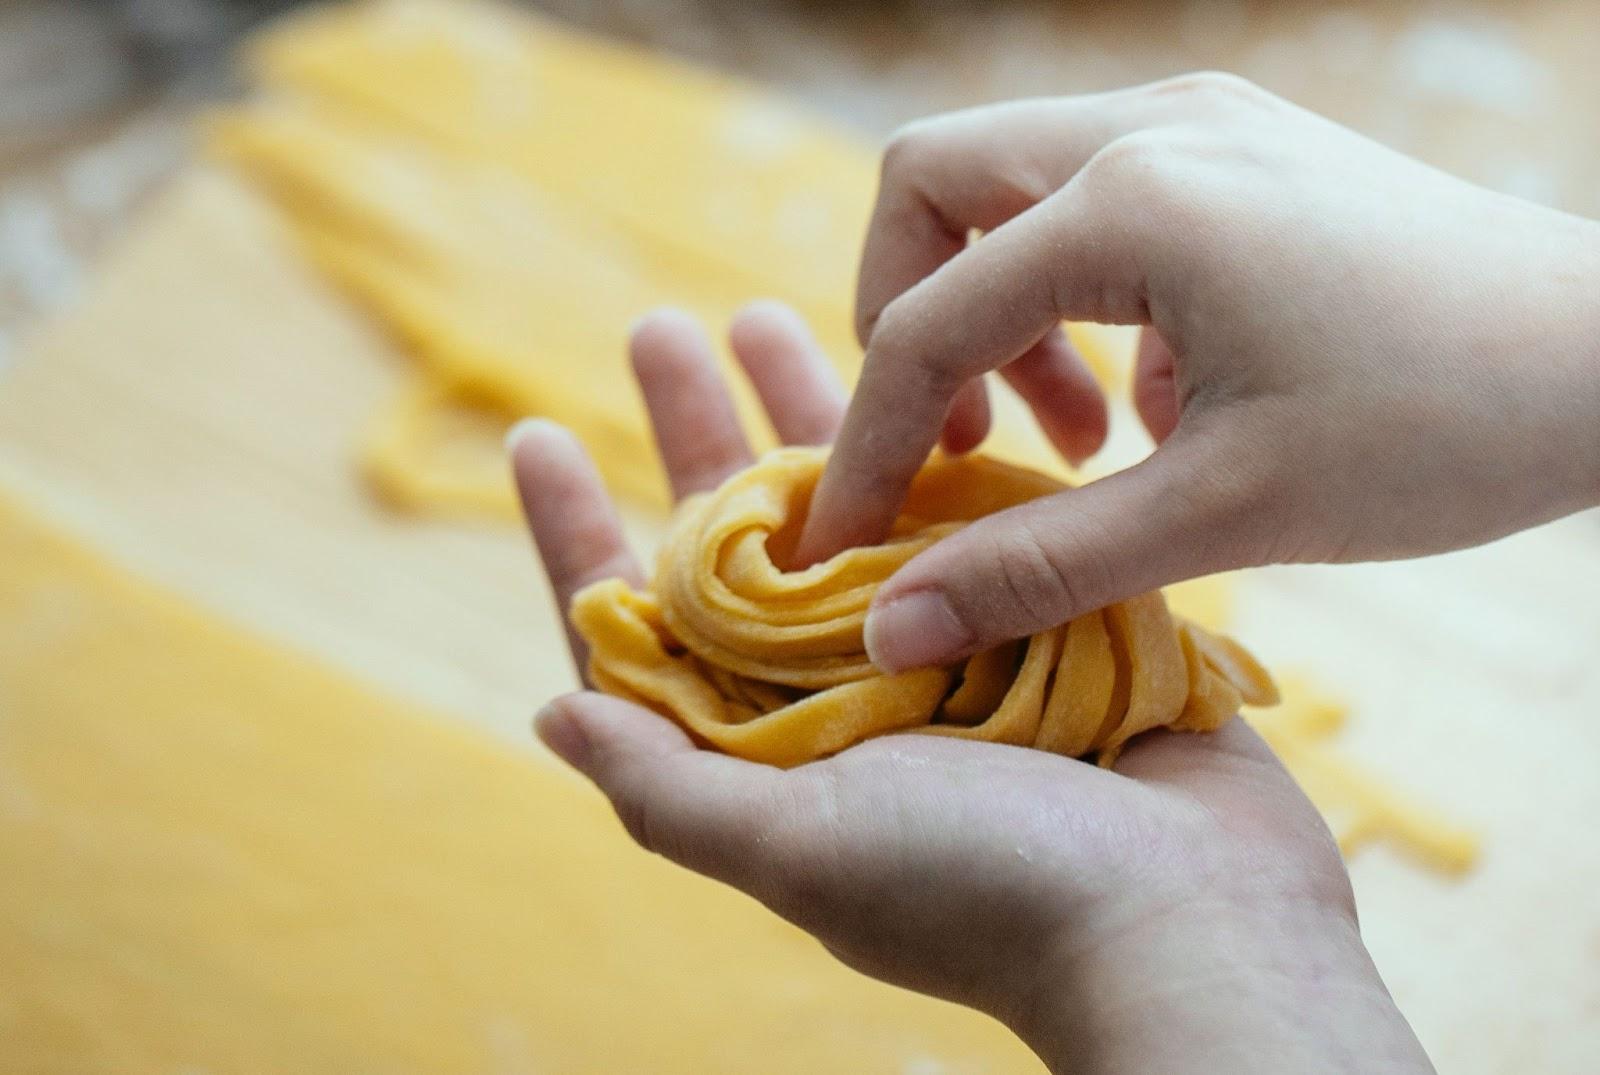 fresh pasta - gluten free pasta recipe - accordingtojo.com